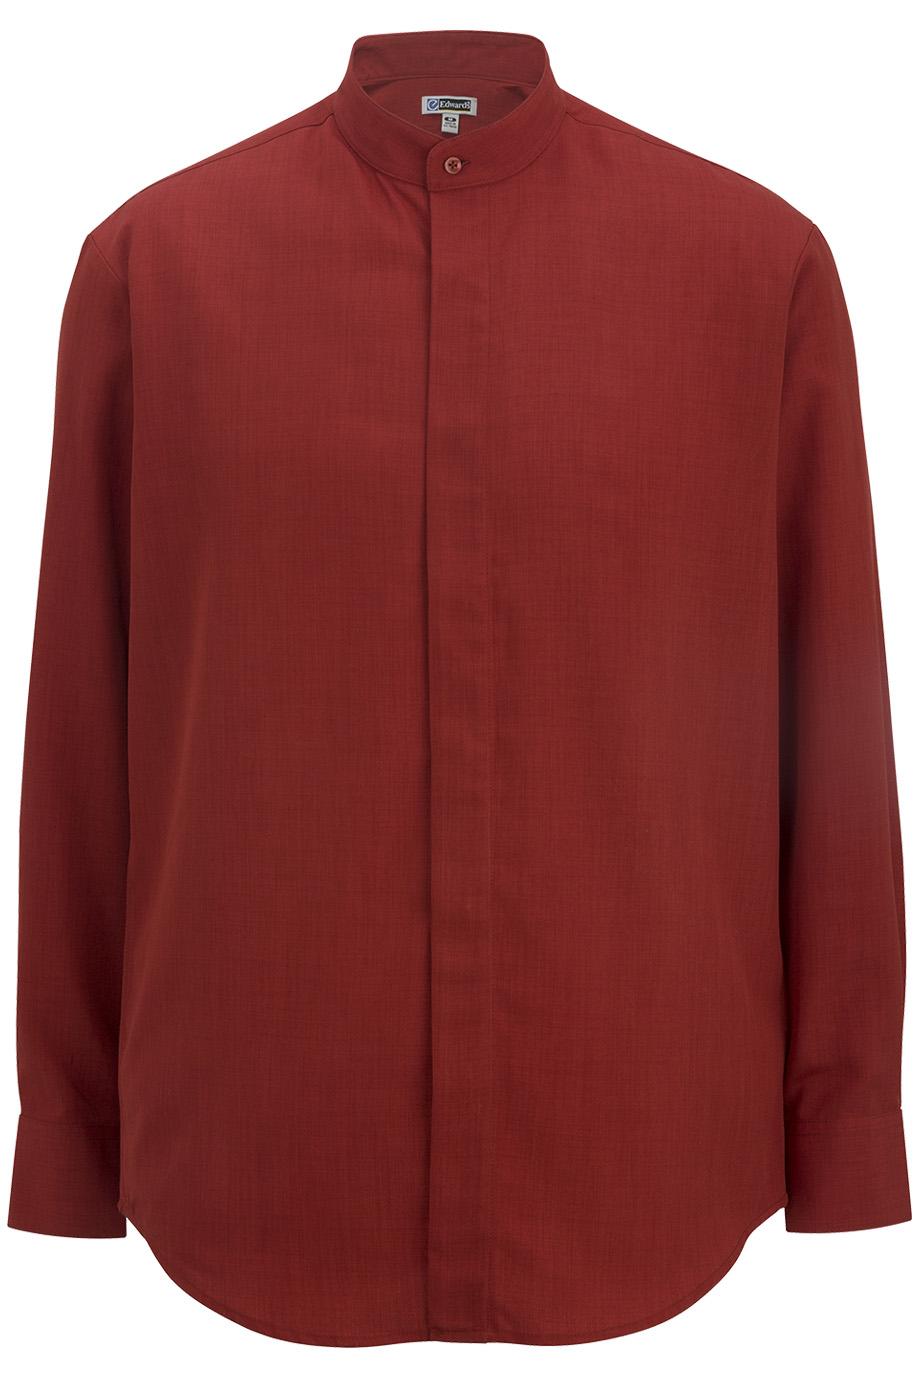 Men's Batiste Banded Collar Shirt 1392